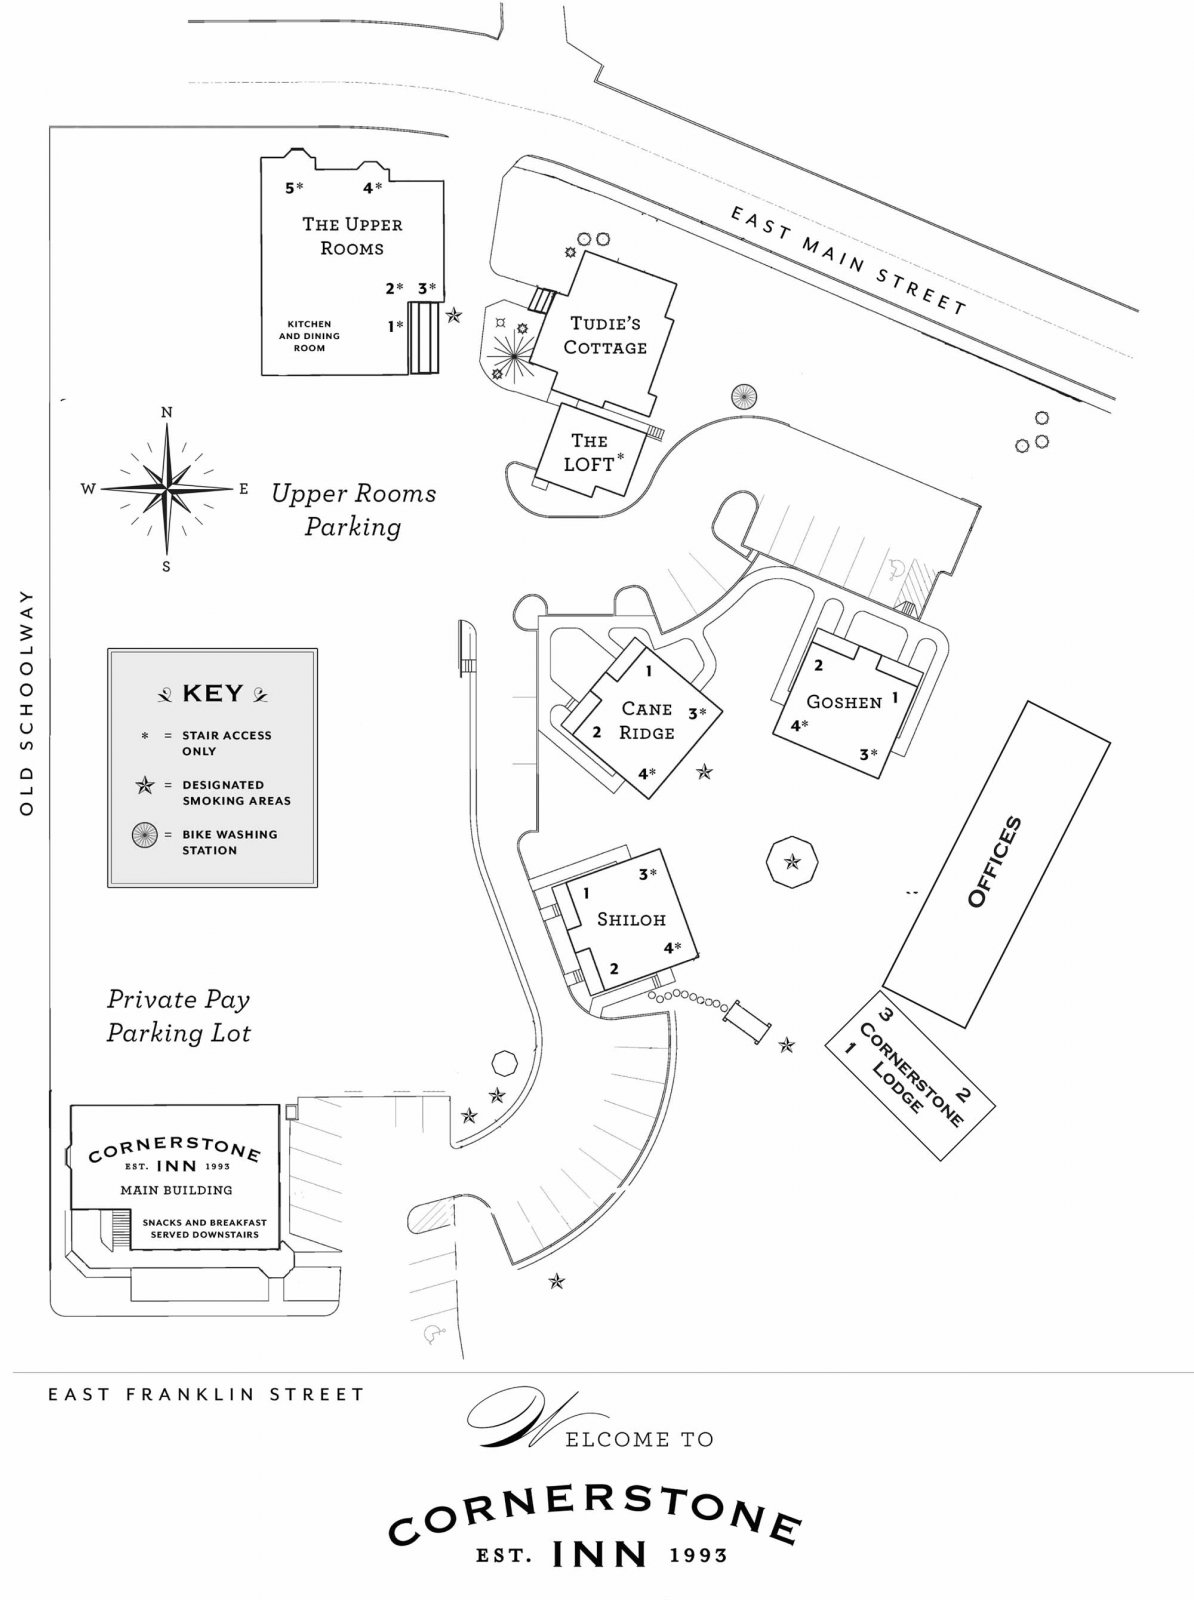 Campus Map of Cornerstone Inn